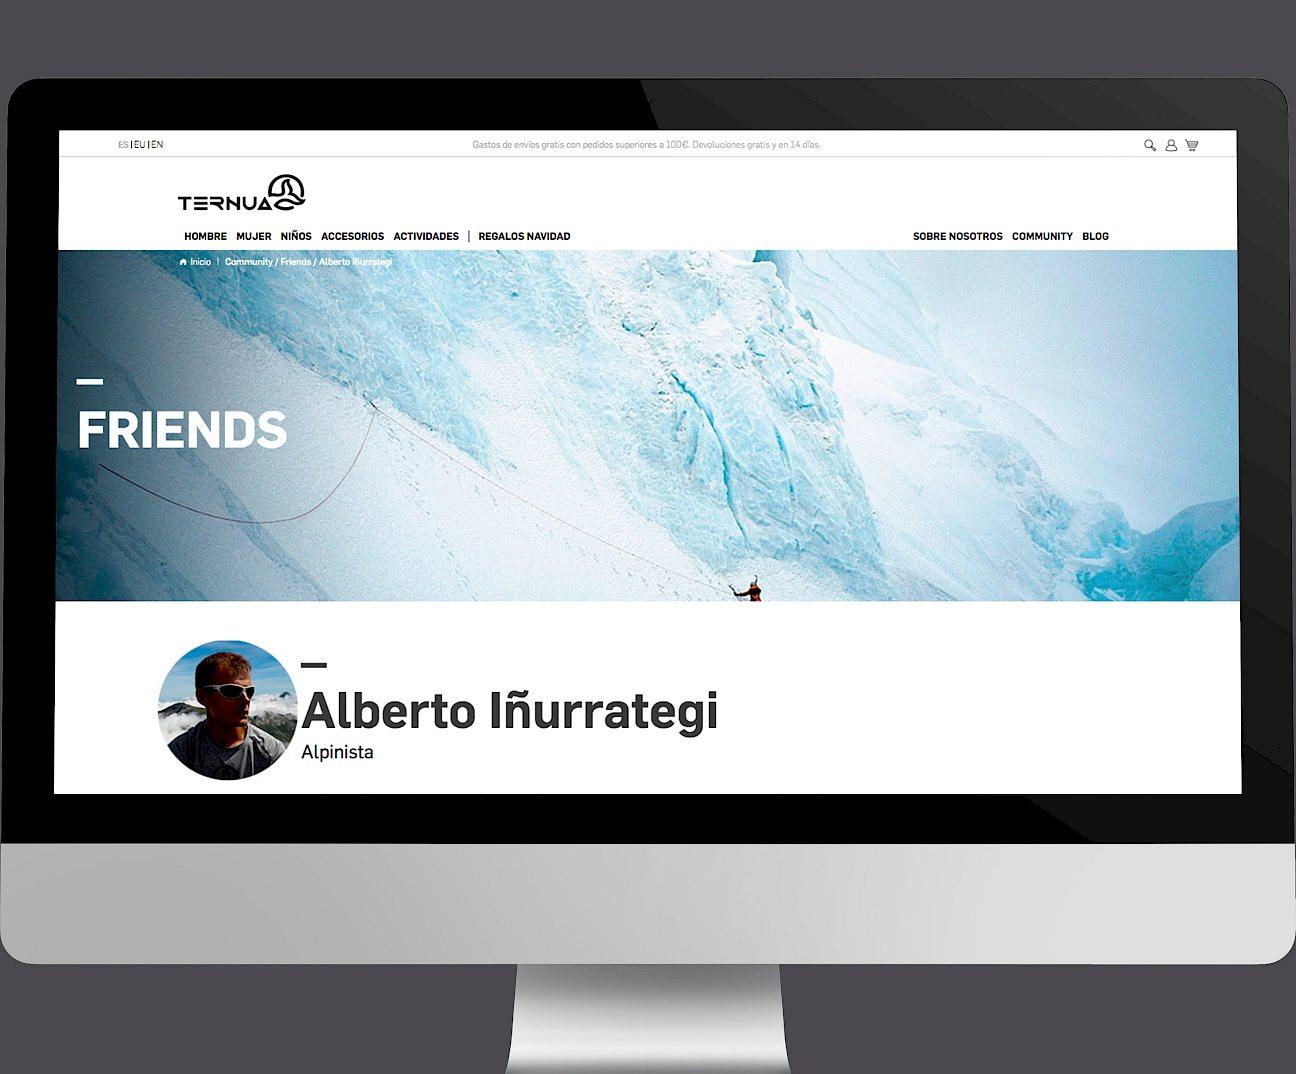 branding move wireframe website design digital ternua 10